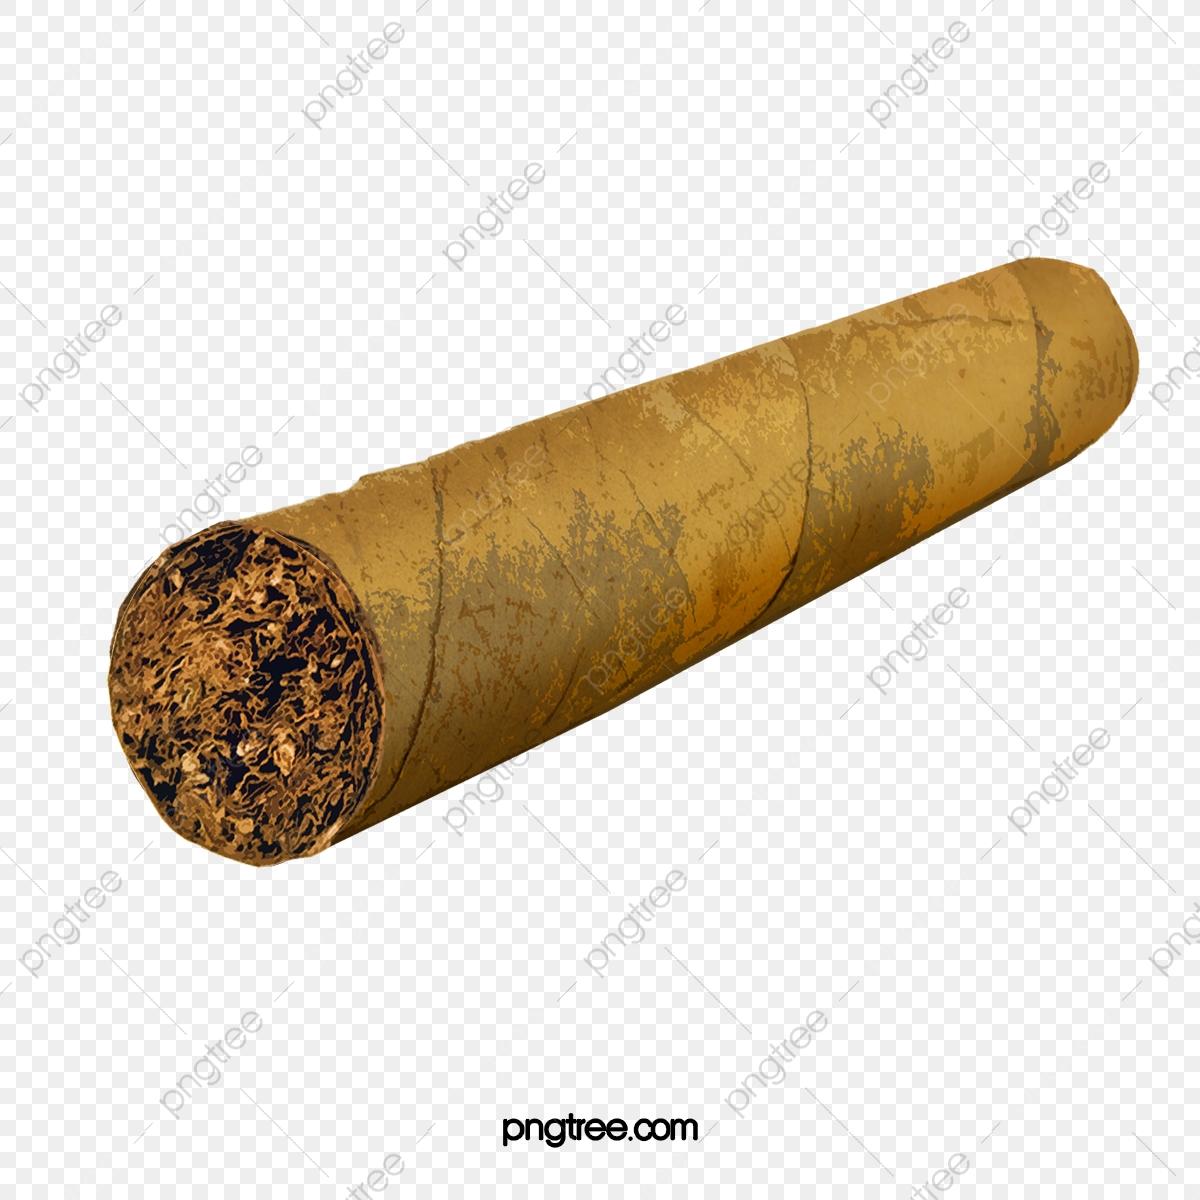 jpg freeuse library Cigarettes smoke the cigarette. Cigar clipart.